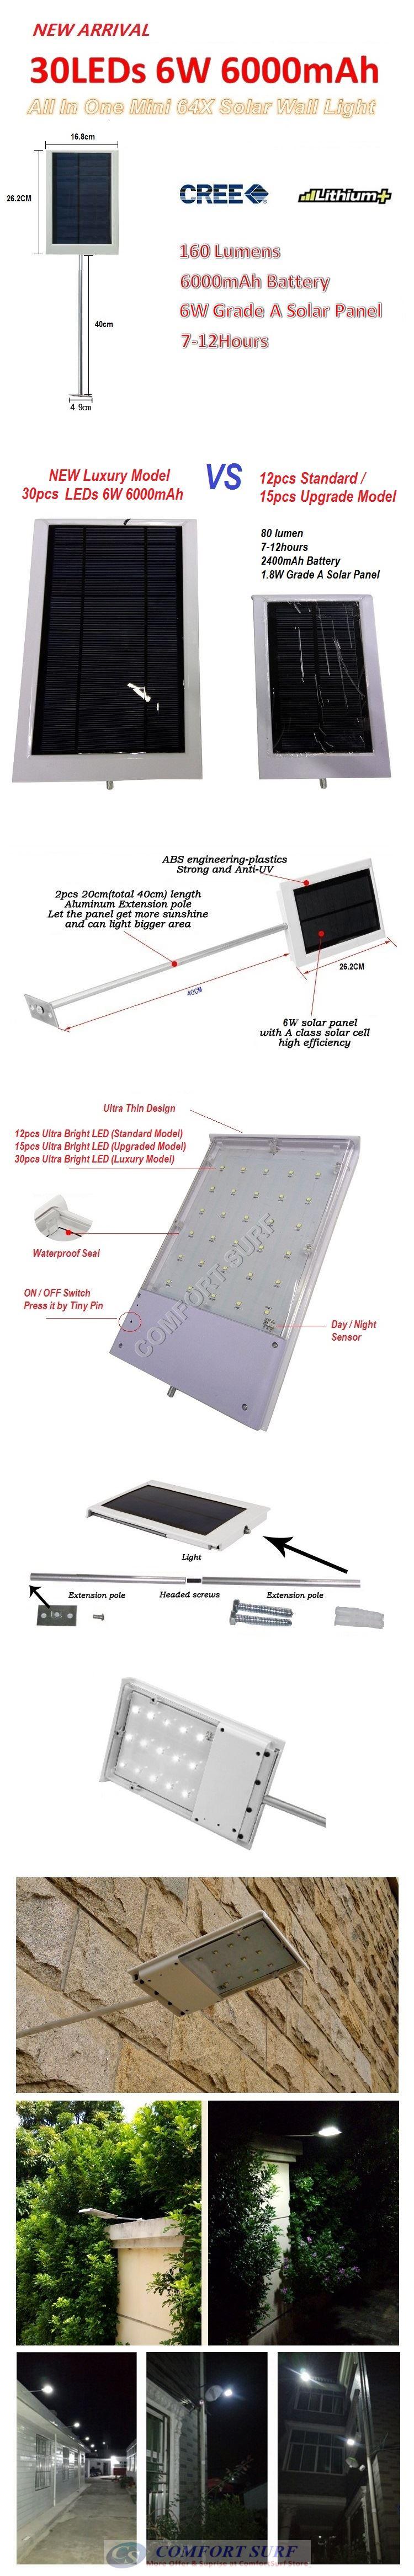 CREE LED 64X Solar Light Outdoor 15 LED Wall Signage Street Lamp Auto On